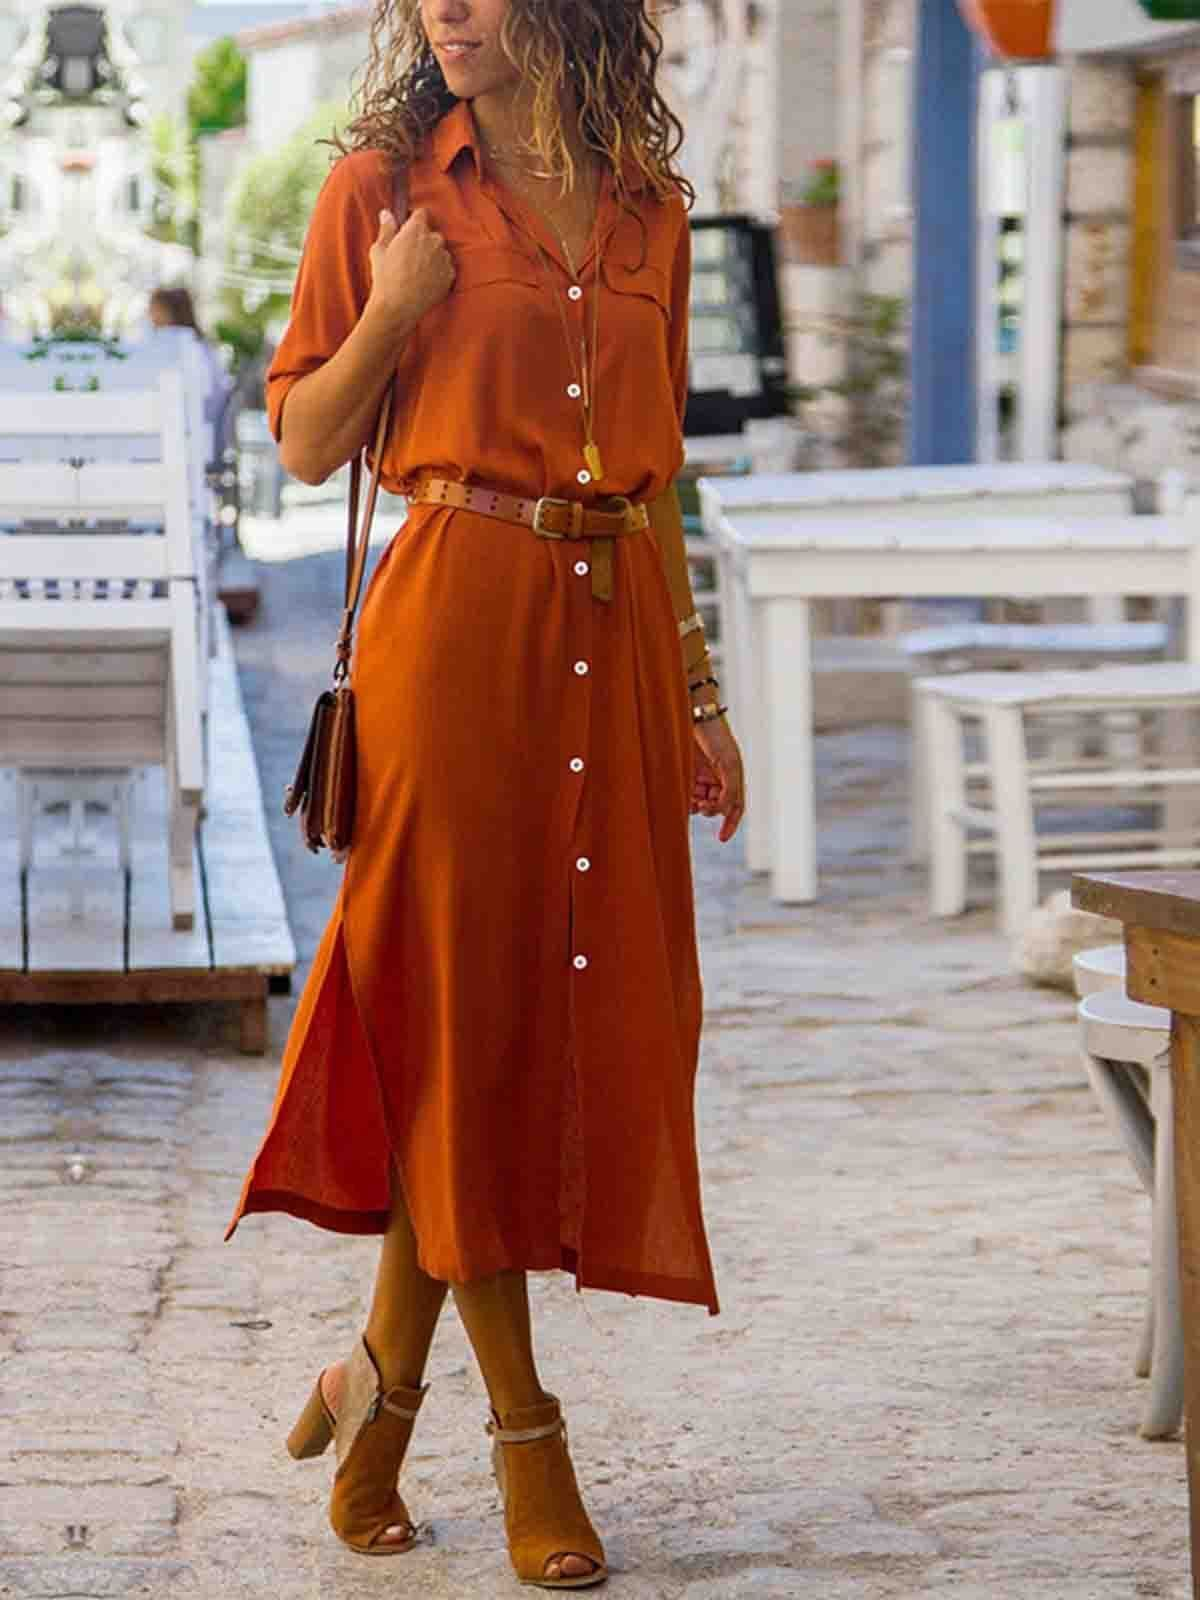 Woman Elegant Long Dress Casual 3 4 Sleeve Shawl Collar Casual Dress Elegant Dresses Long Long Dress Casual Boho Sleeveless Dress [ 1600 x 1200 Pixel ]